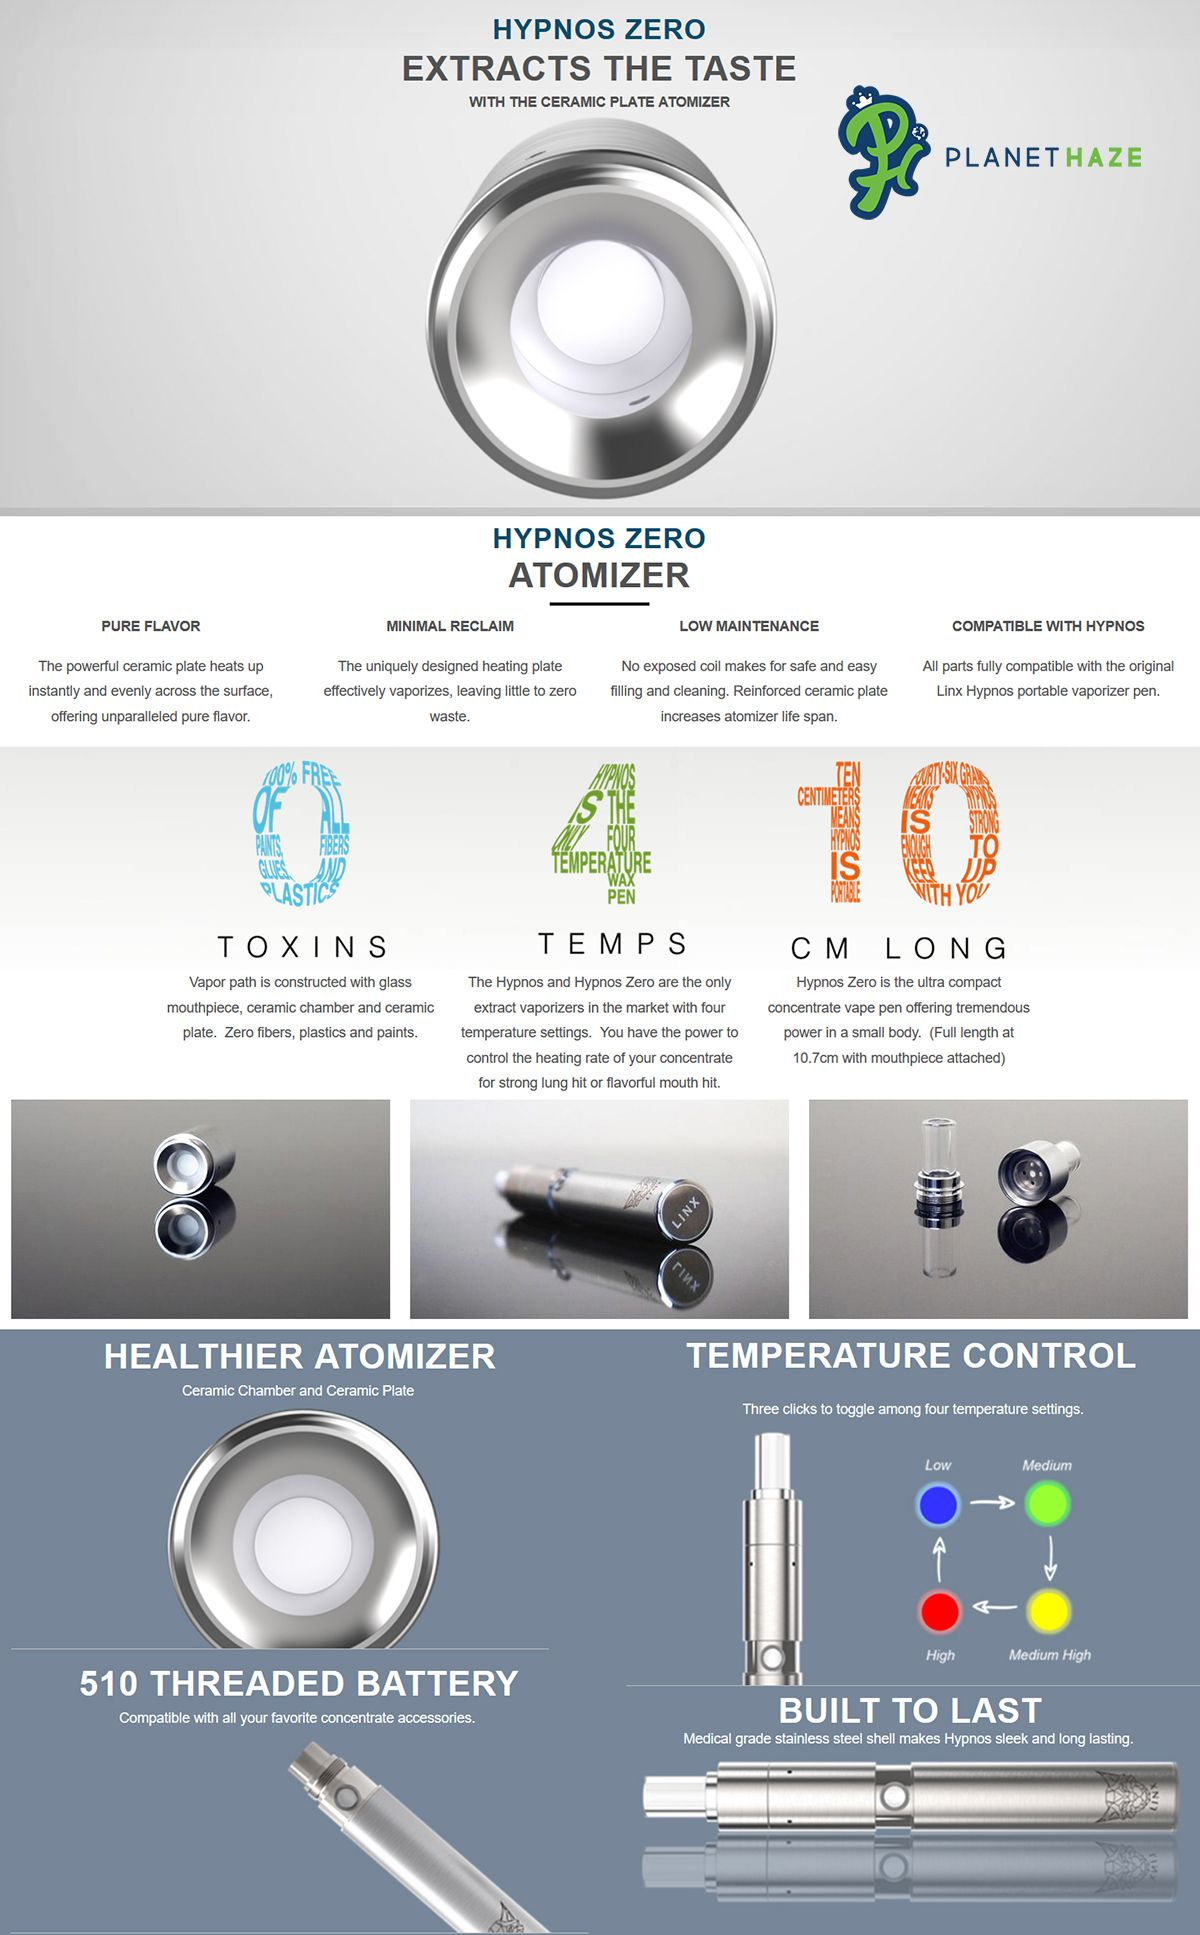 Linx Hypnos Zero Features